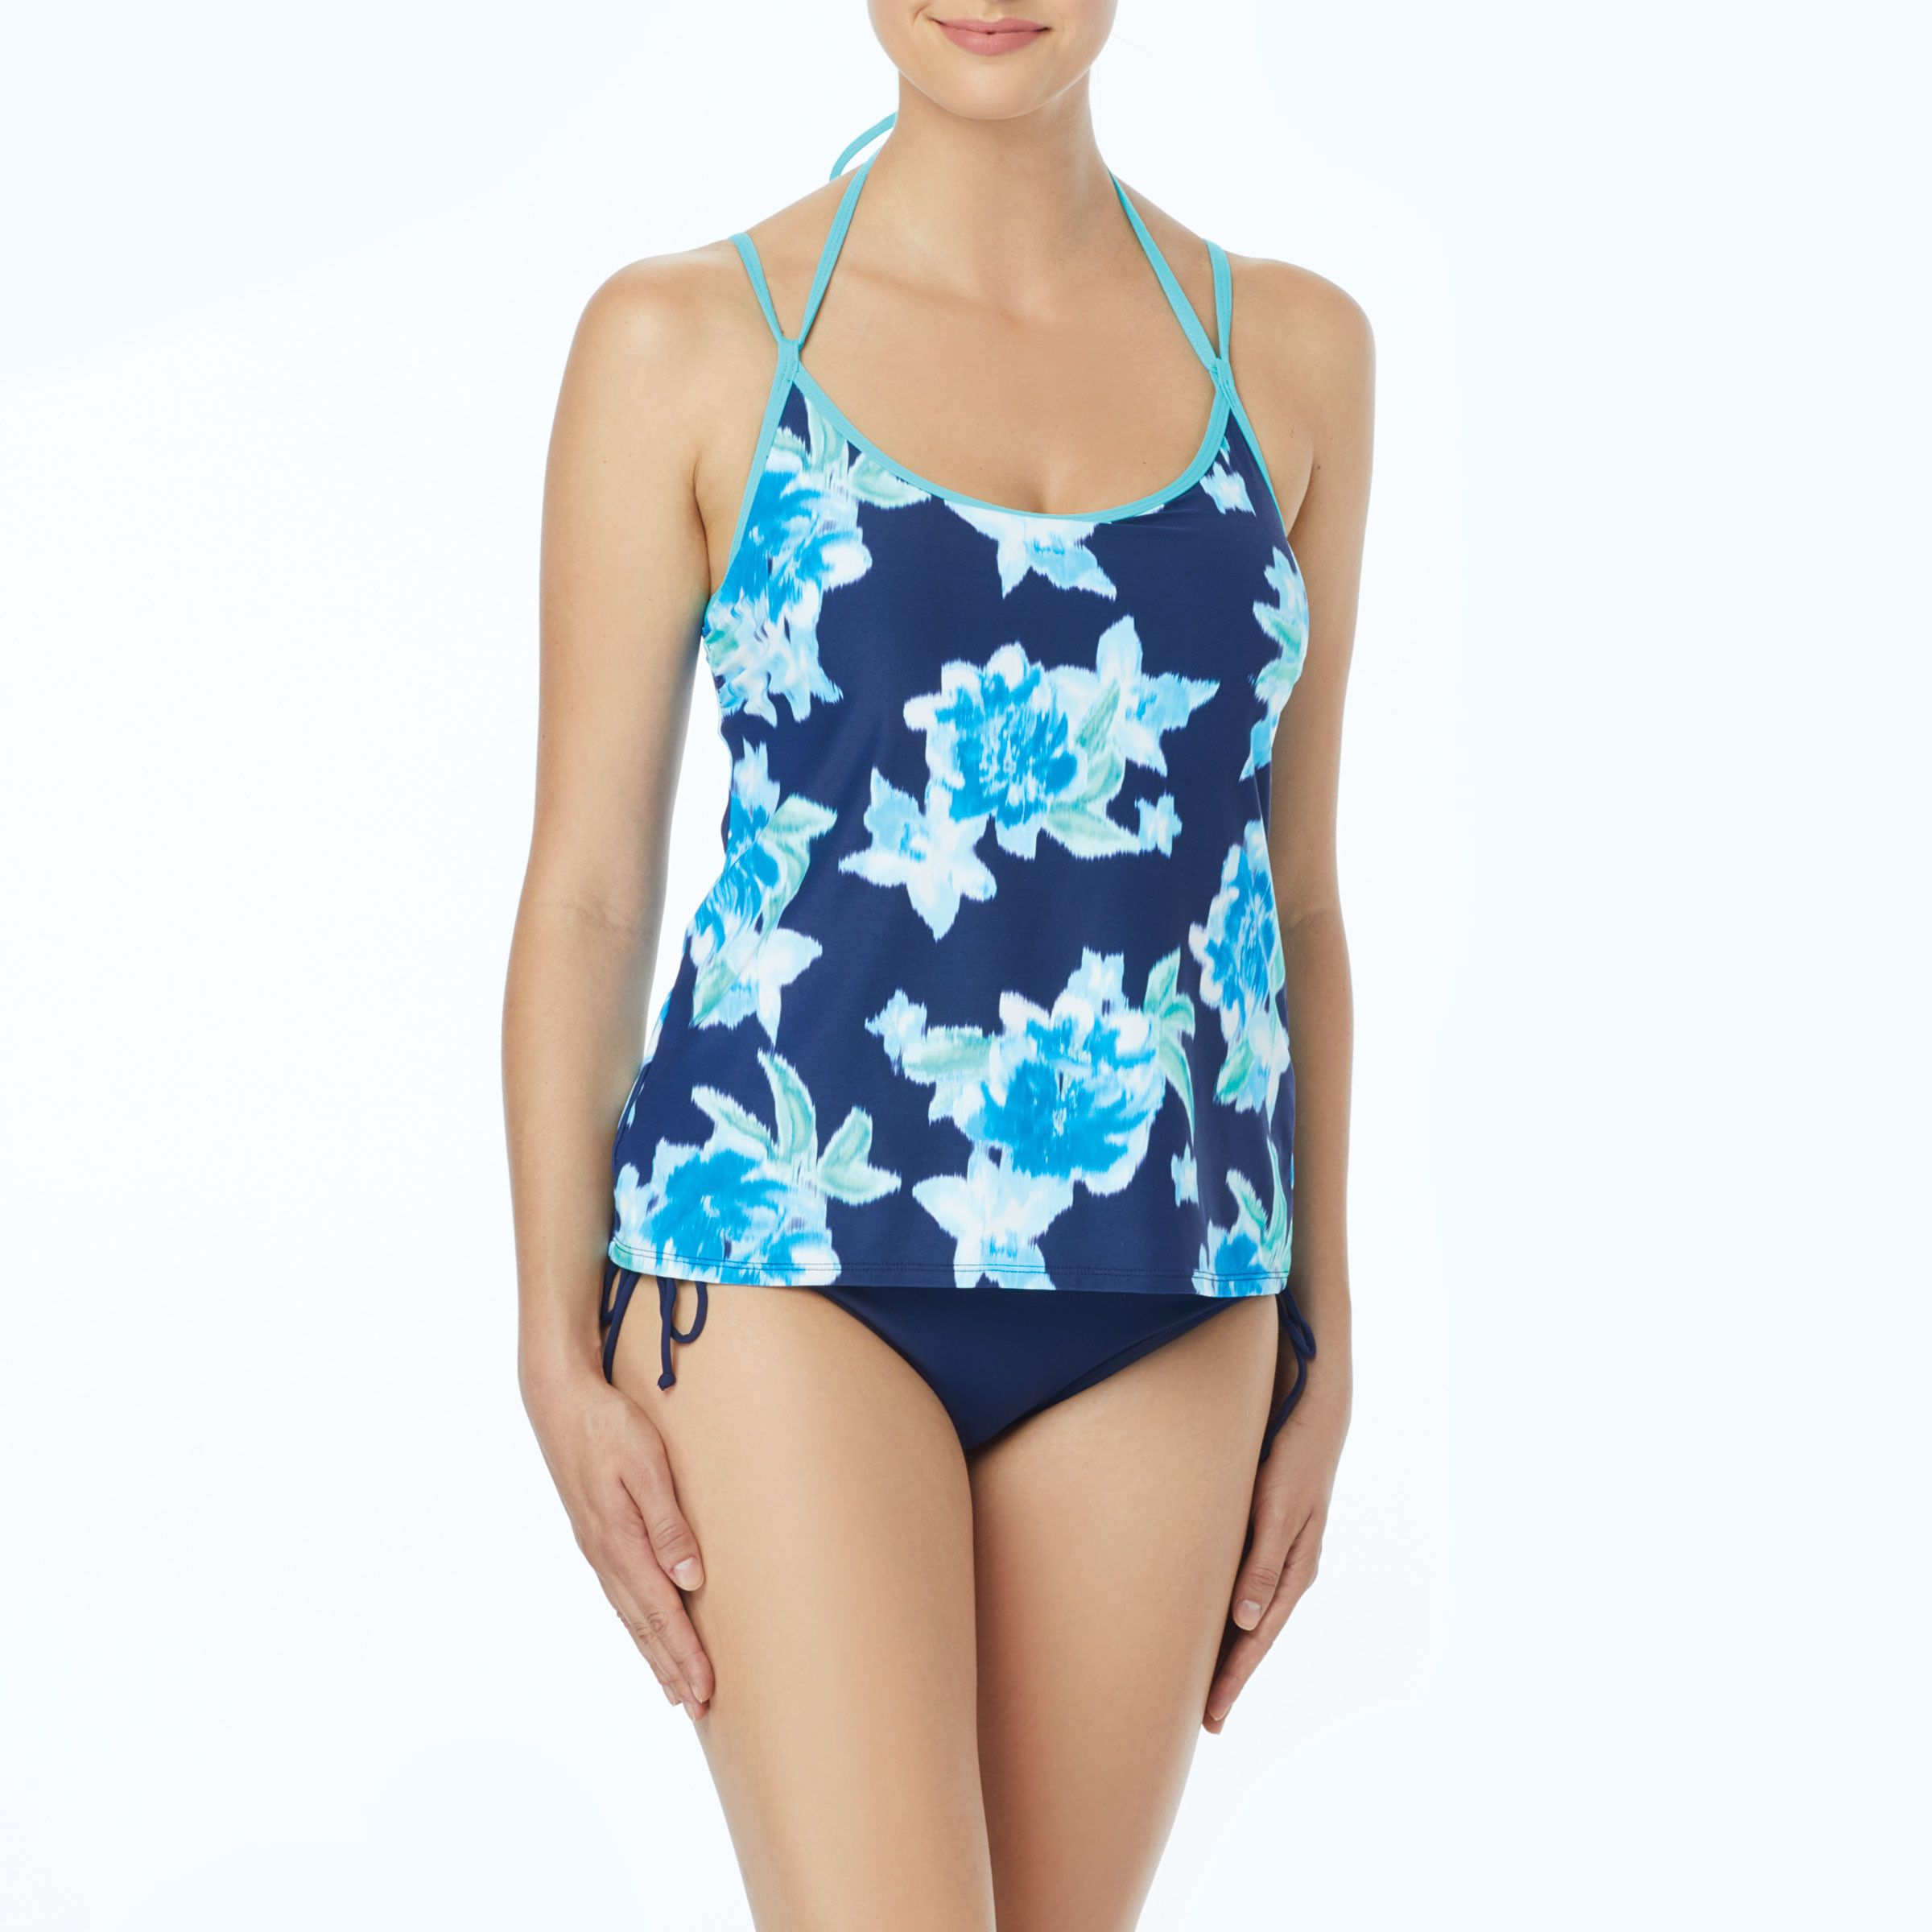 dbbad25f9d4 Blair Spliced High Neck One Piece Swimsuit - Key Largo | | S h o p ...